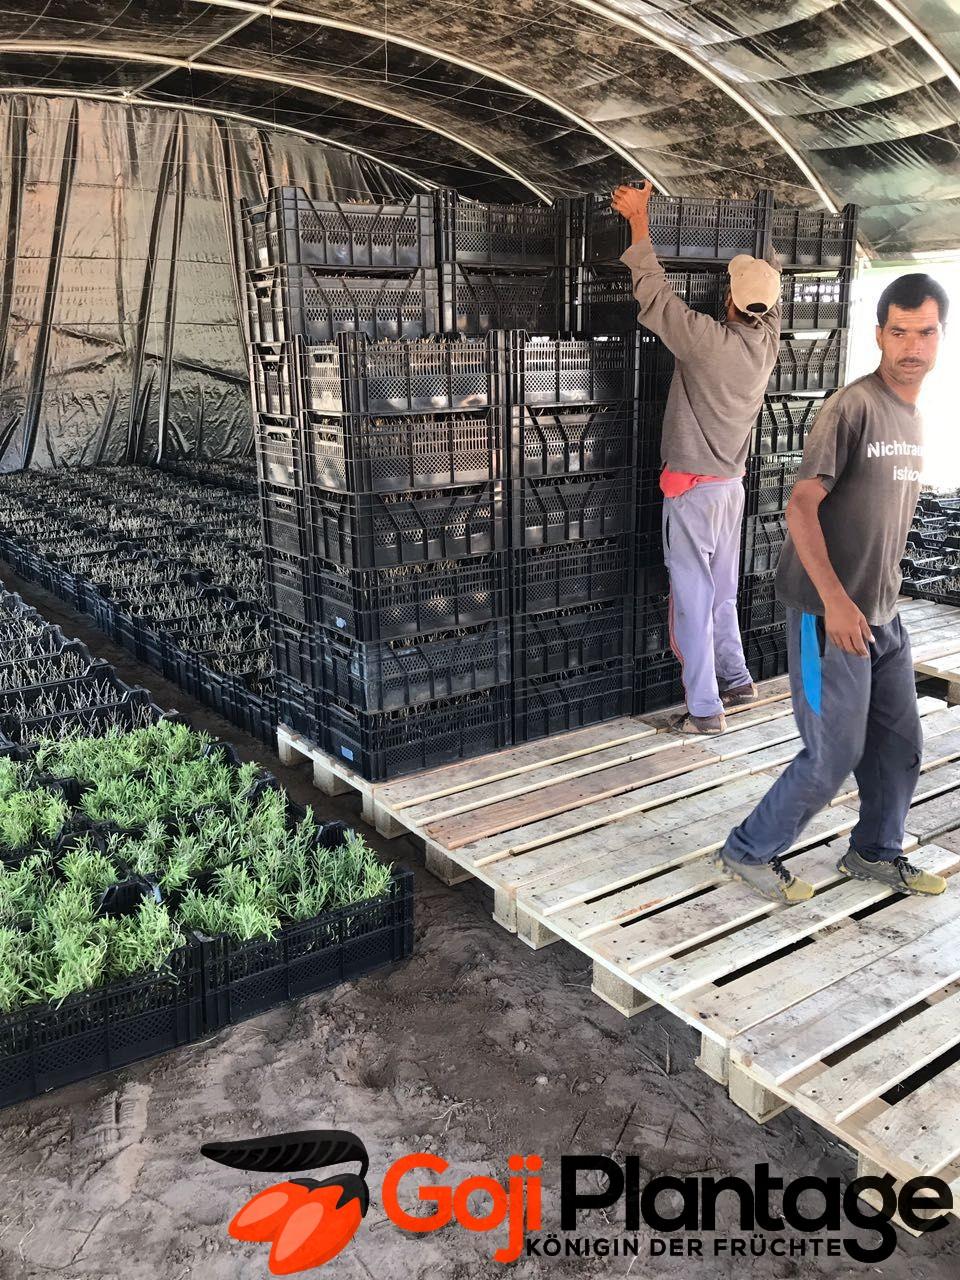 goji plantage marokko goji plantage. Black Bedroom Furniture Sets. Home Design Ideas